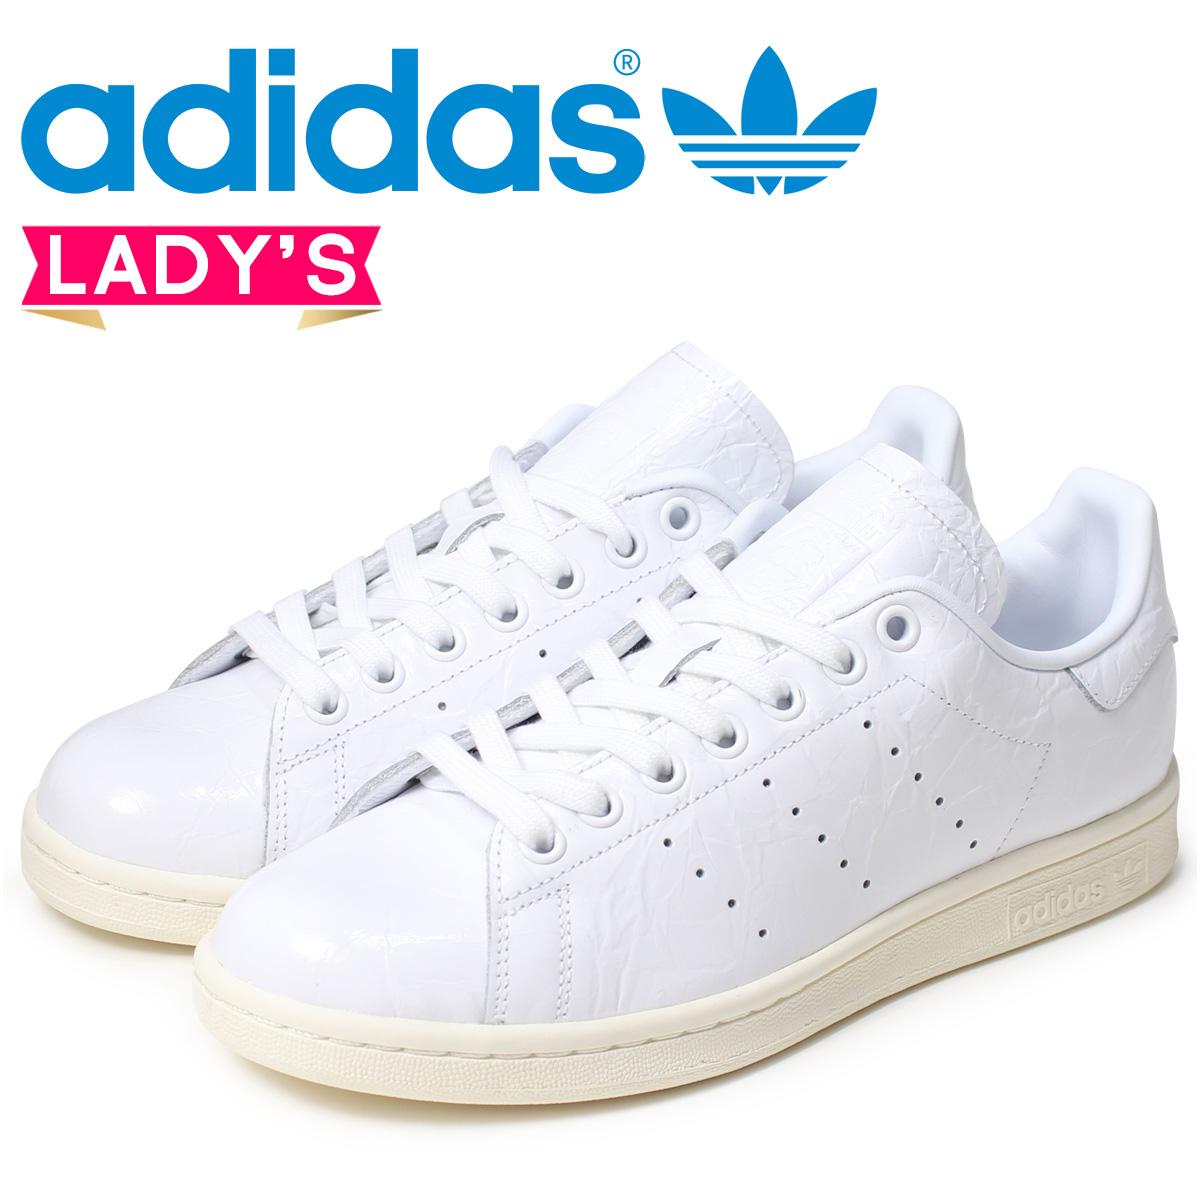 best service b0fa8 5eb3d Adidas Stan Smith Lady's sneakers adidas originals STAN SMITH W BB5162  shoes white originals [12/22 Shinnyu load]